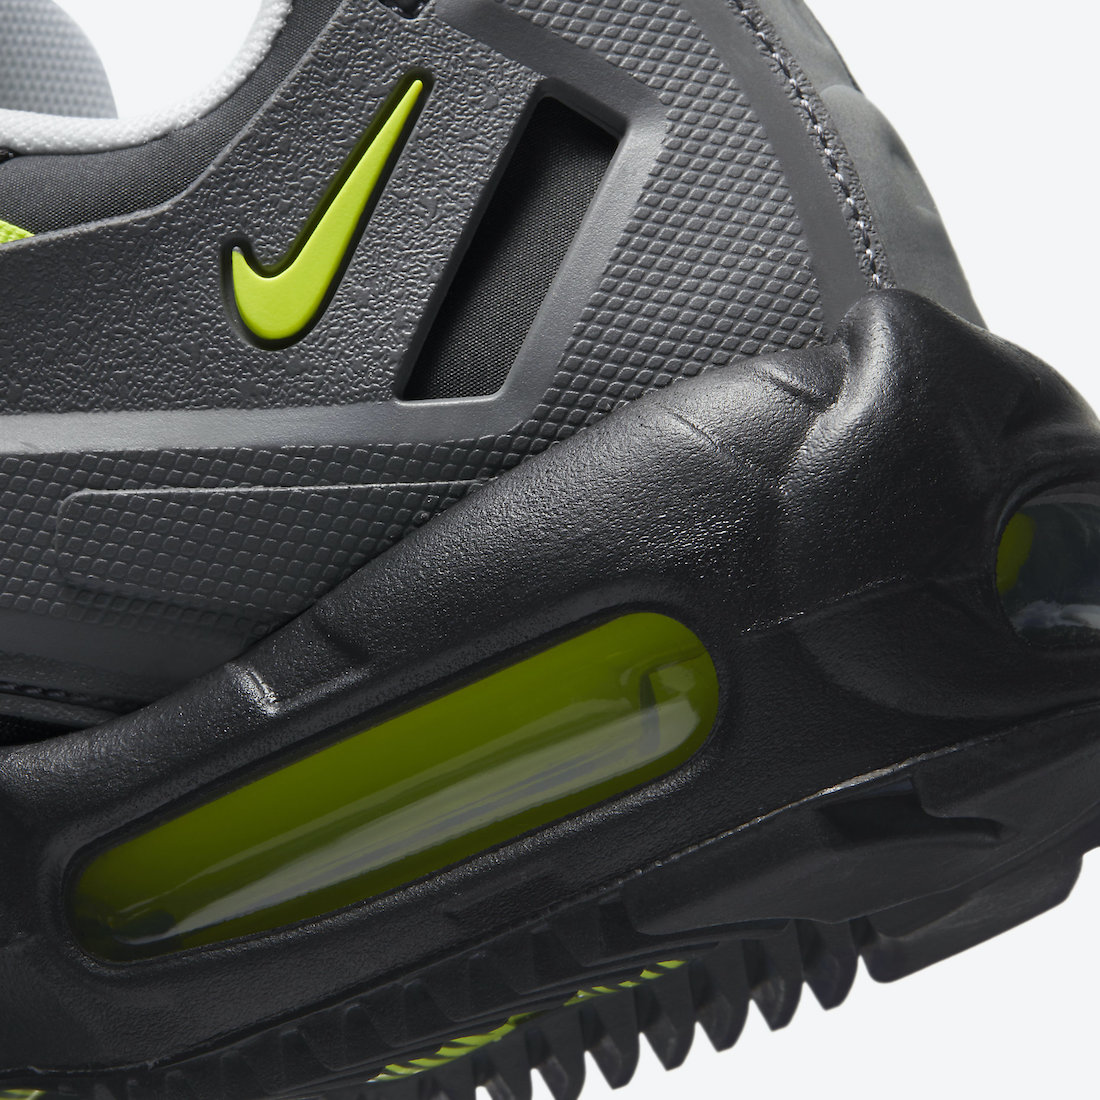 Nike-NDSTRKT-AM95-Neon-CZ3591-002-Release-Date-7